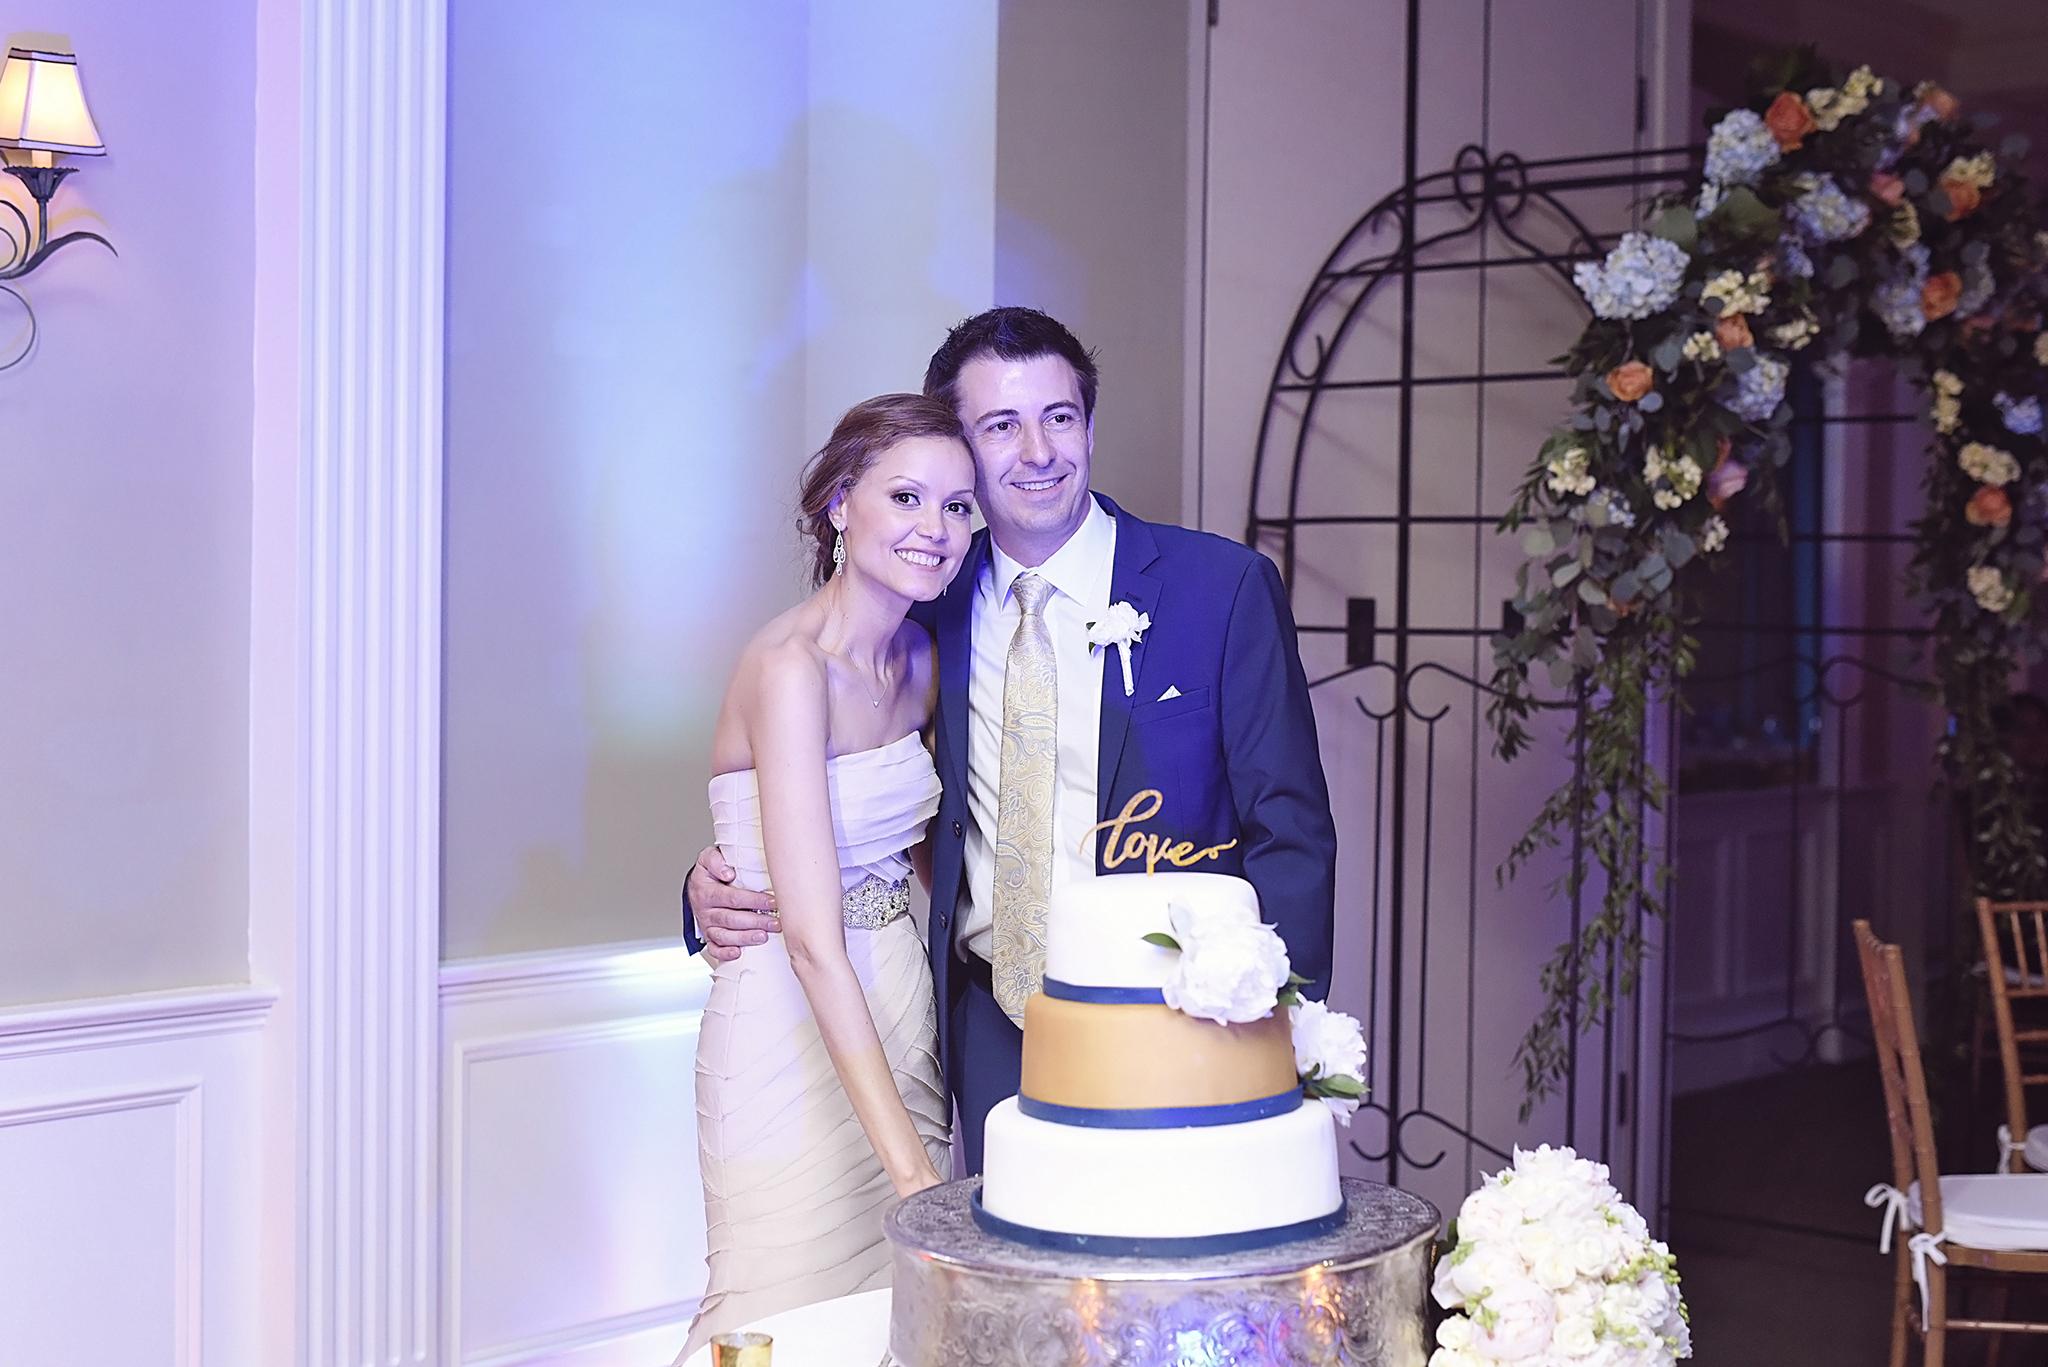 NJ-NY-wedding-photographer-169NJ-NY-wedding-photographer-169NJ-NY-WEDDING-PHOTOGRAPHER-169.JPG